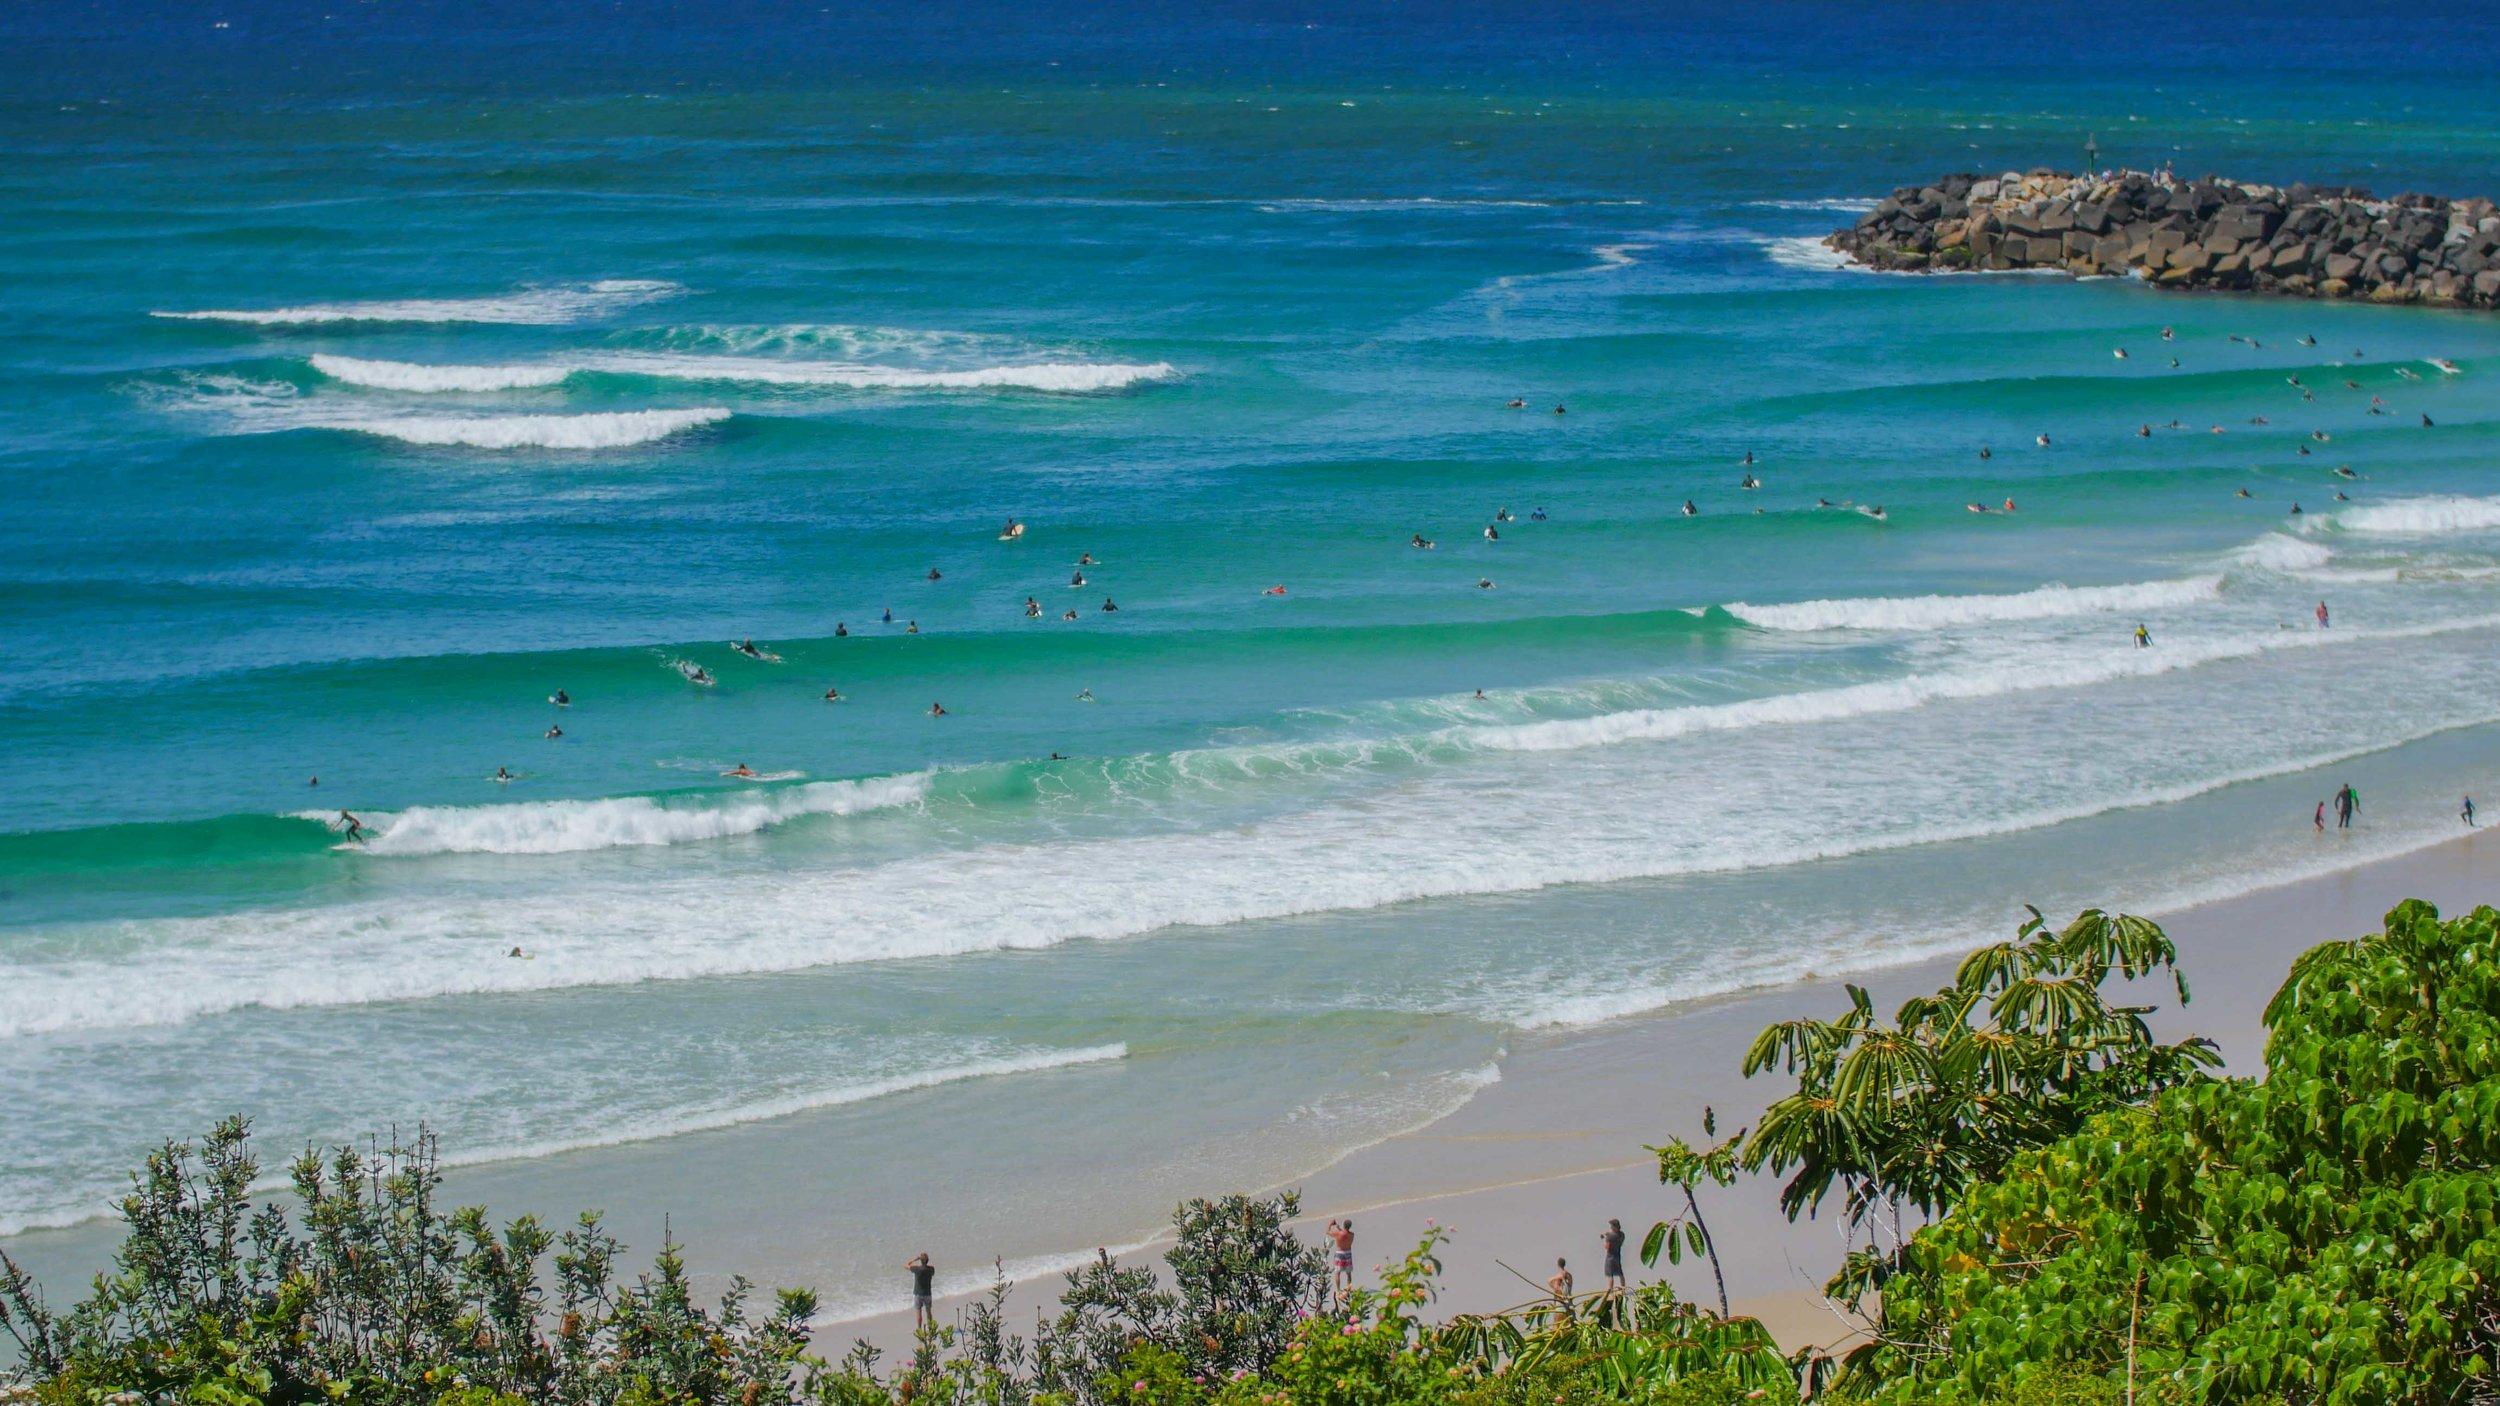 D-Bah surfing, Gold Coast